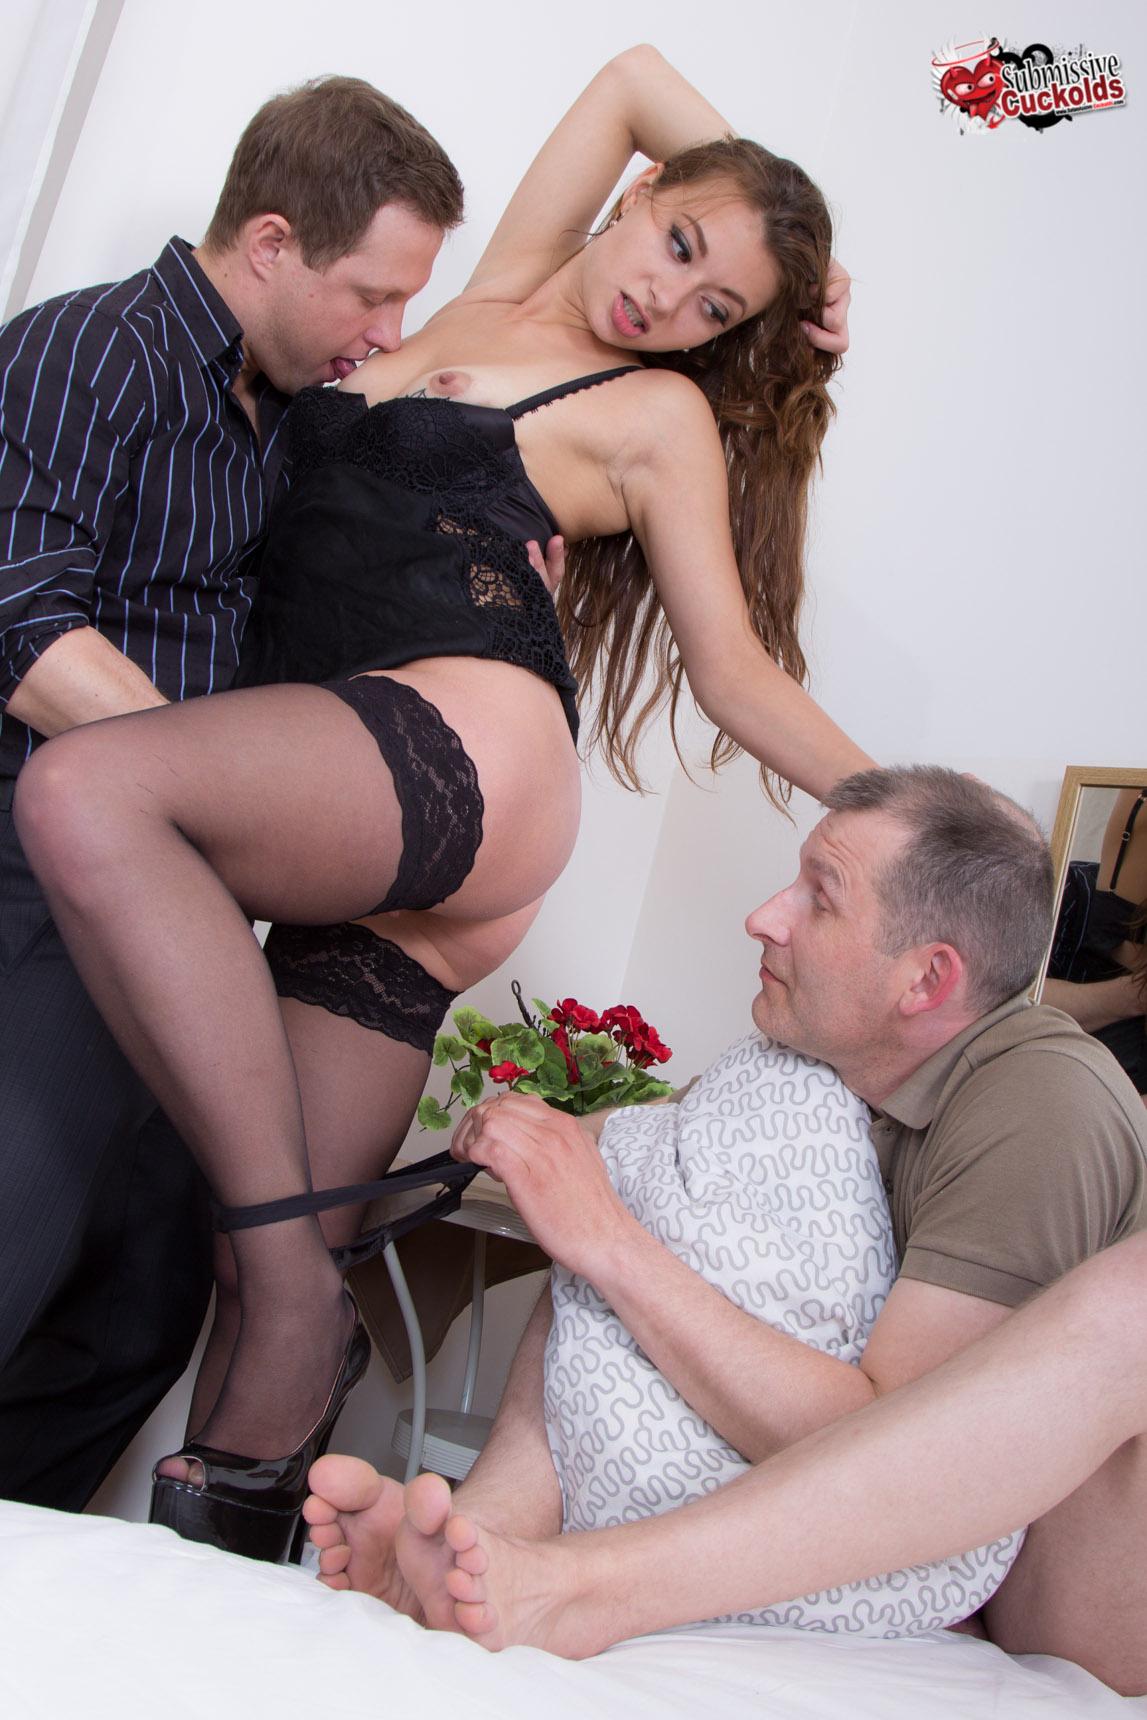 Obese women masturbate positions